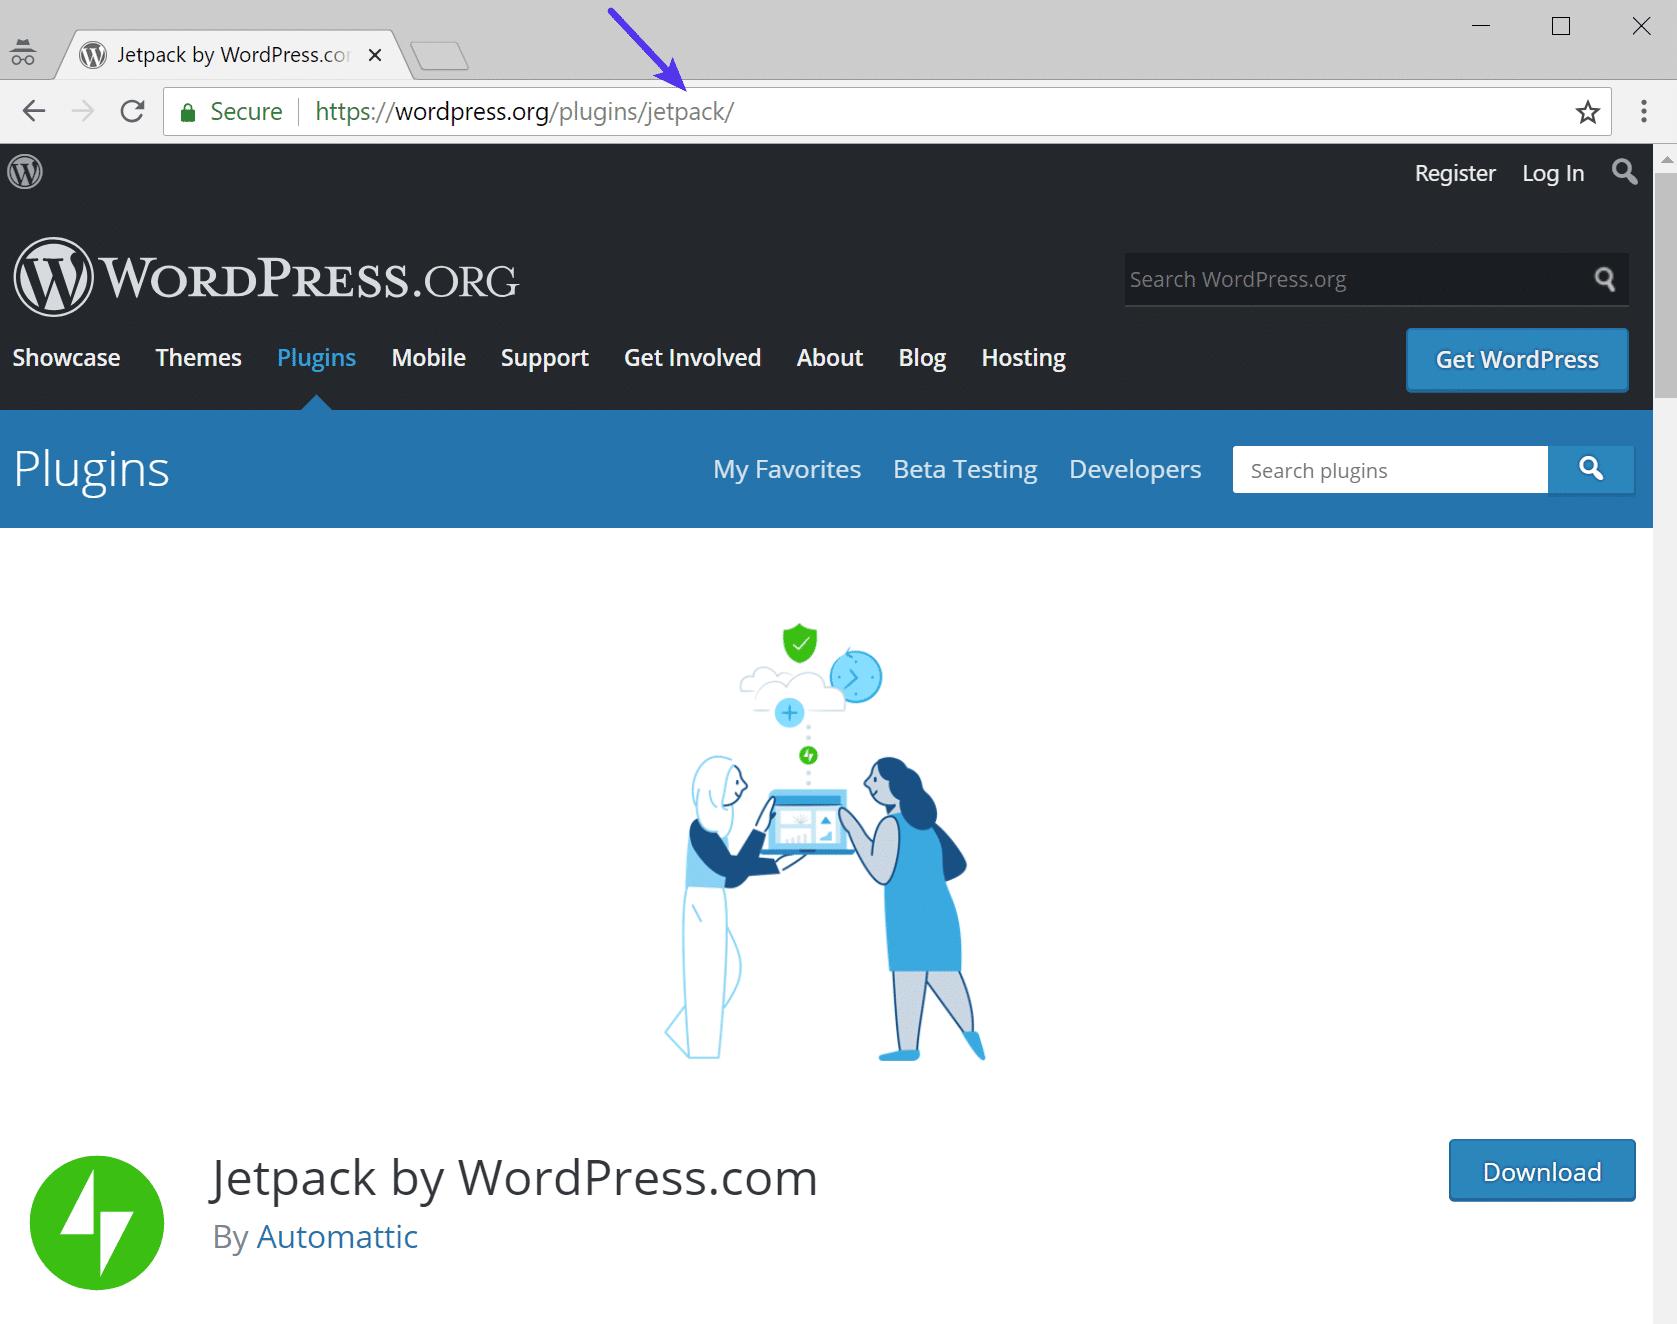 WordPressプラグインリポジトリのURL